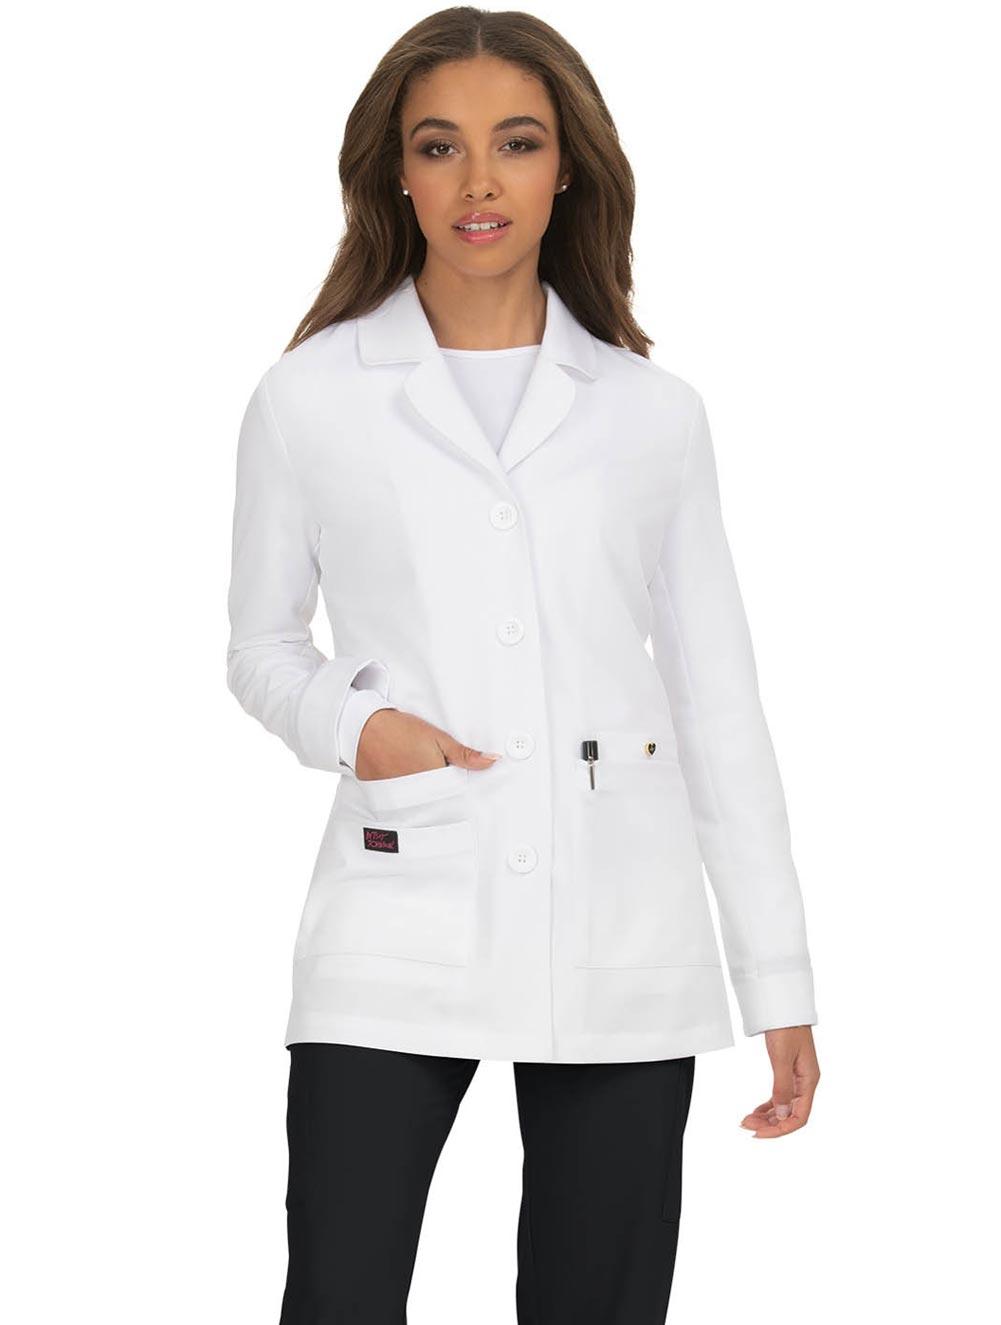 'Canna' Lab Coat